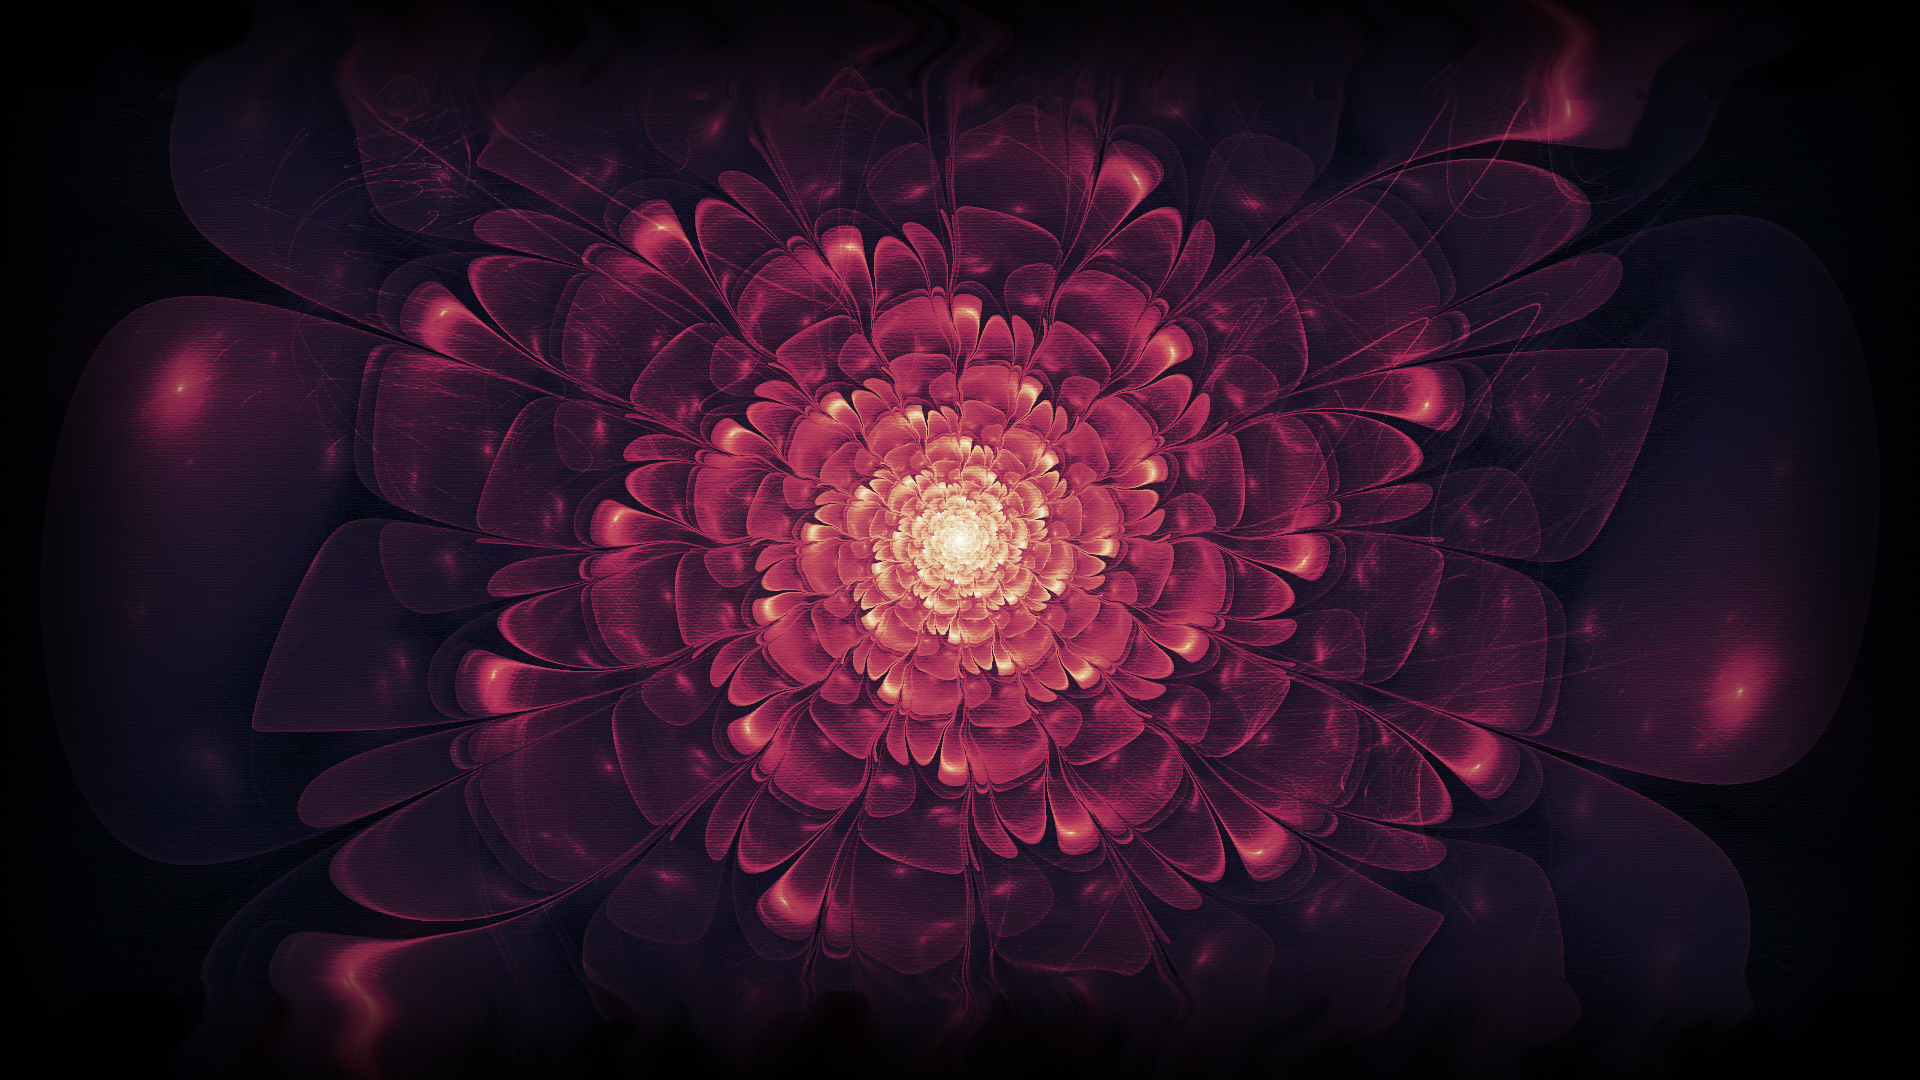 Fractal flower by Perbear42 on DeviantArt